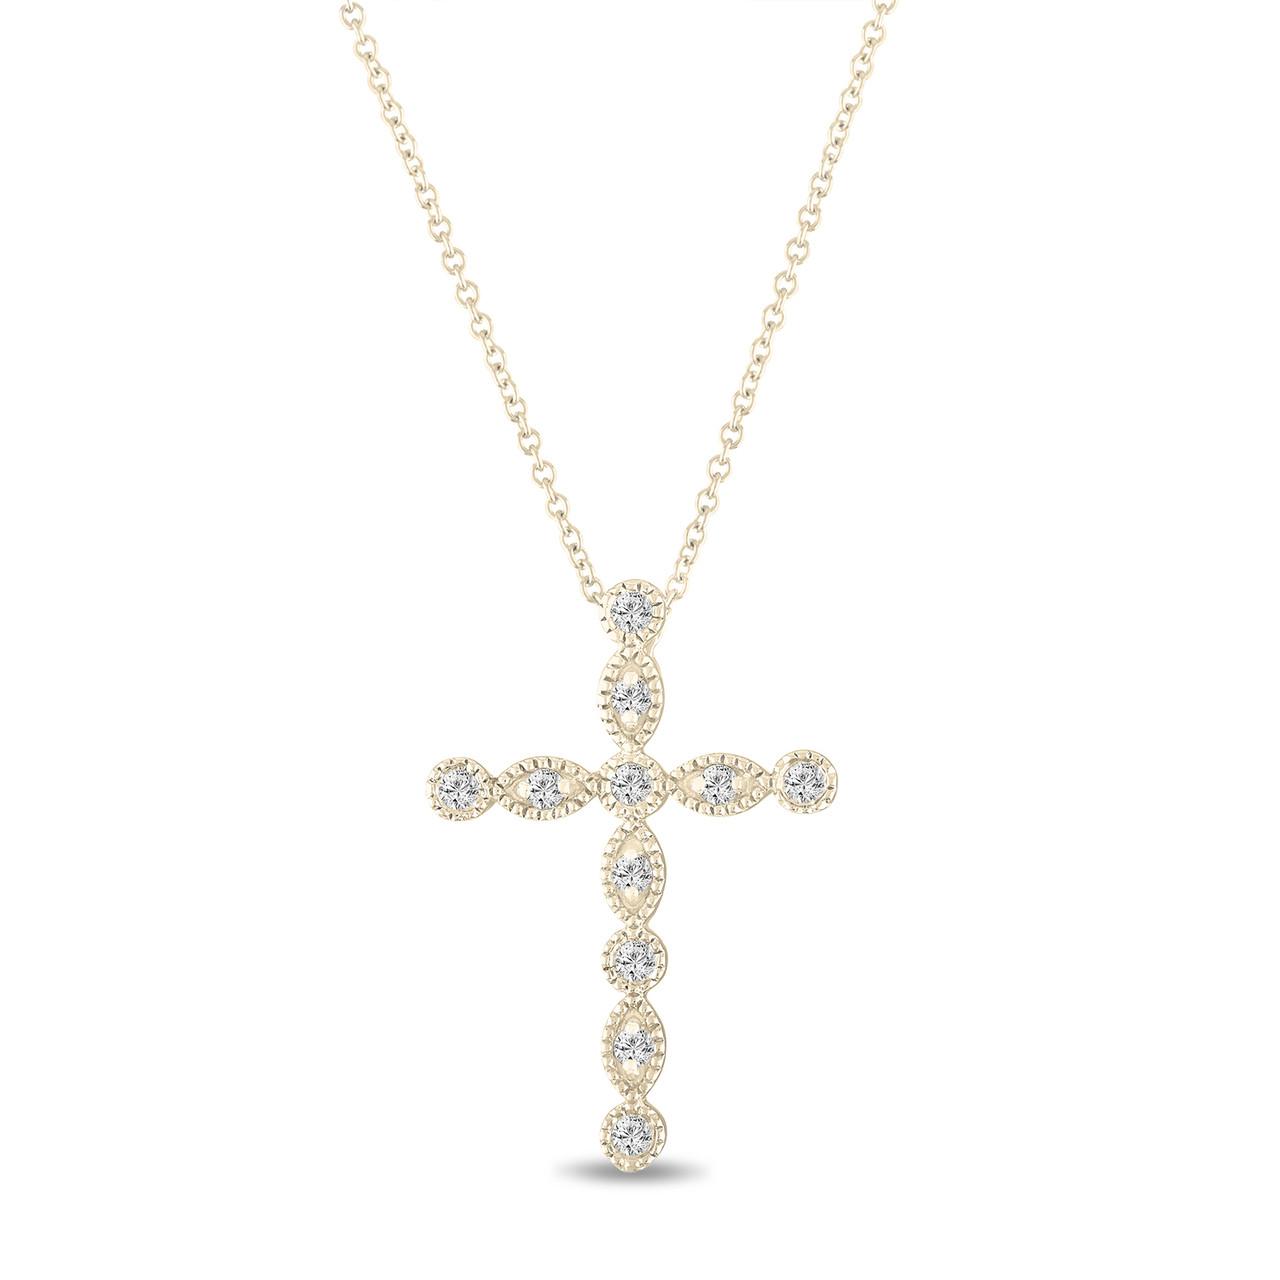 032 carat diamond cross pendant necklace 14k yellow gold pave bezel 032 carat diamond cross pendant necklace 14k yellow gold pave bezel set handmade aloadofball Gallery